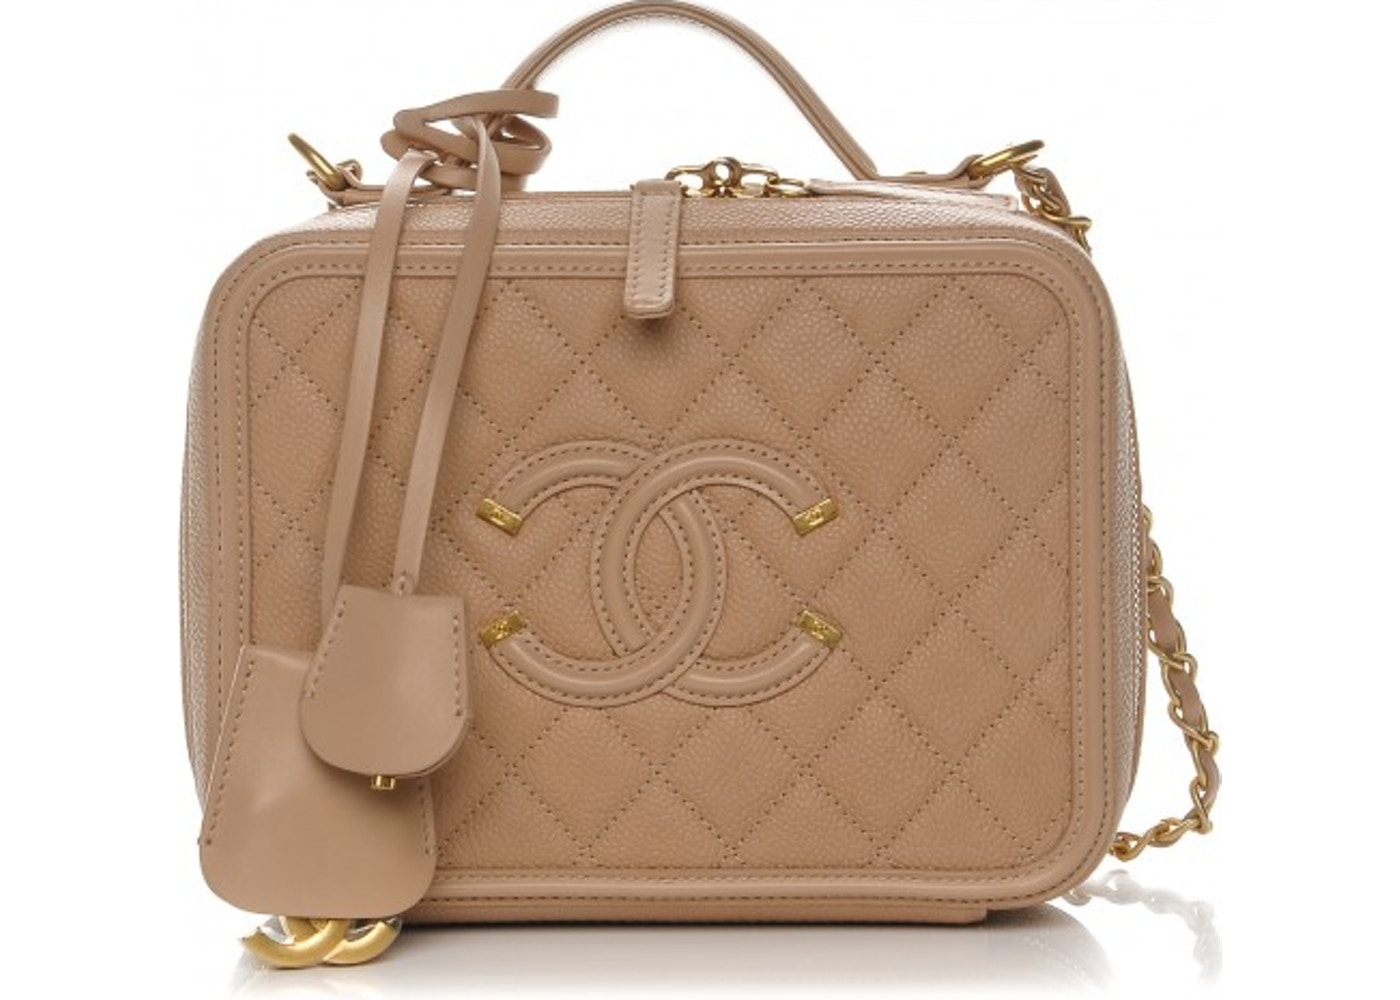 454edba930a7 Buy   Sell Chanel Filigree Handbags